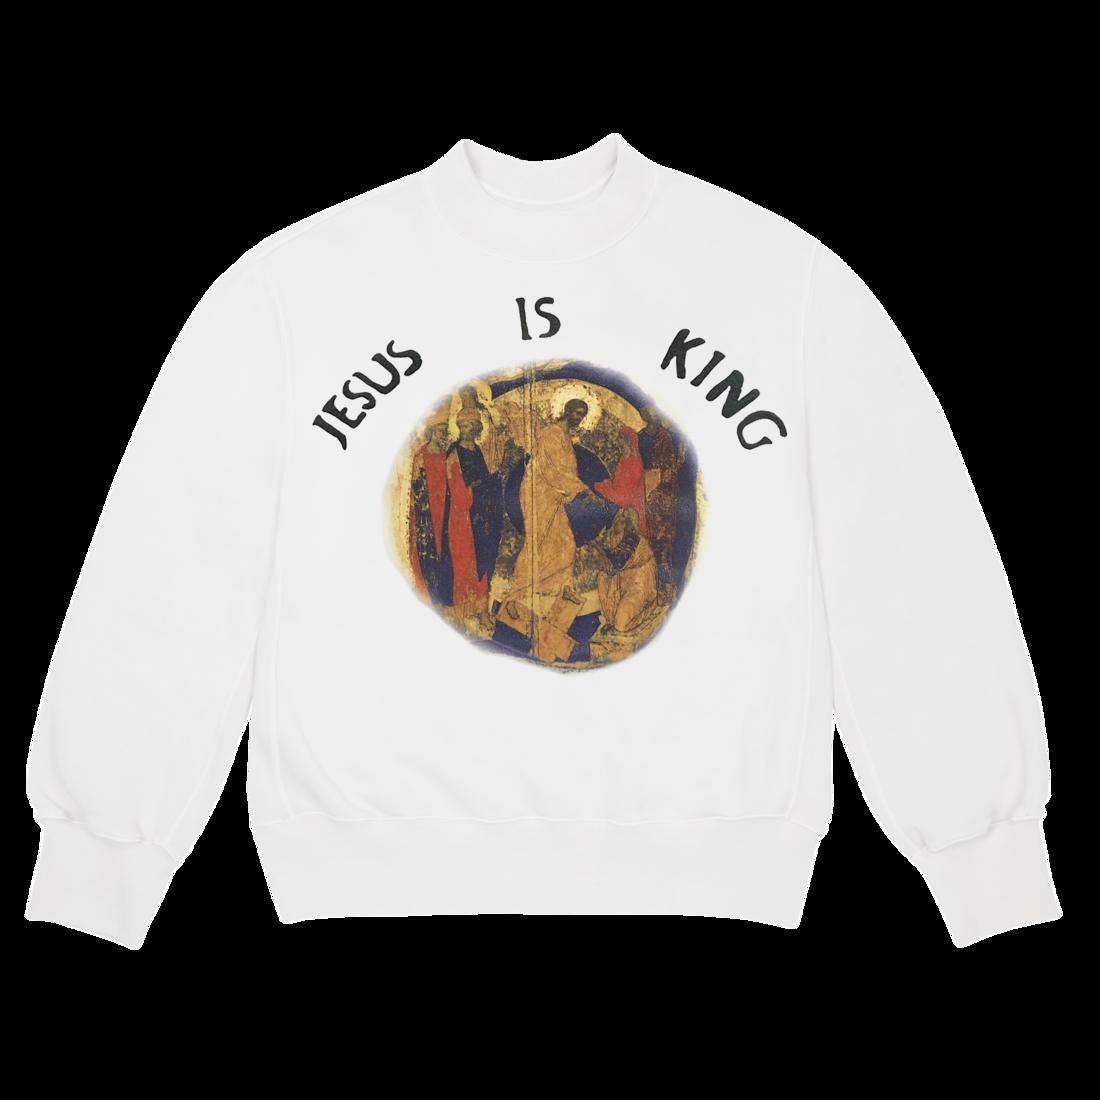 Jesus Is King Painting Crewneck Ii Kanye West King Outfit Kanye West Adidas Jesus Is King Kanye